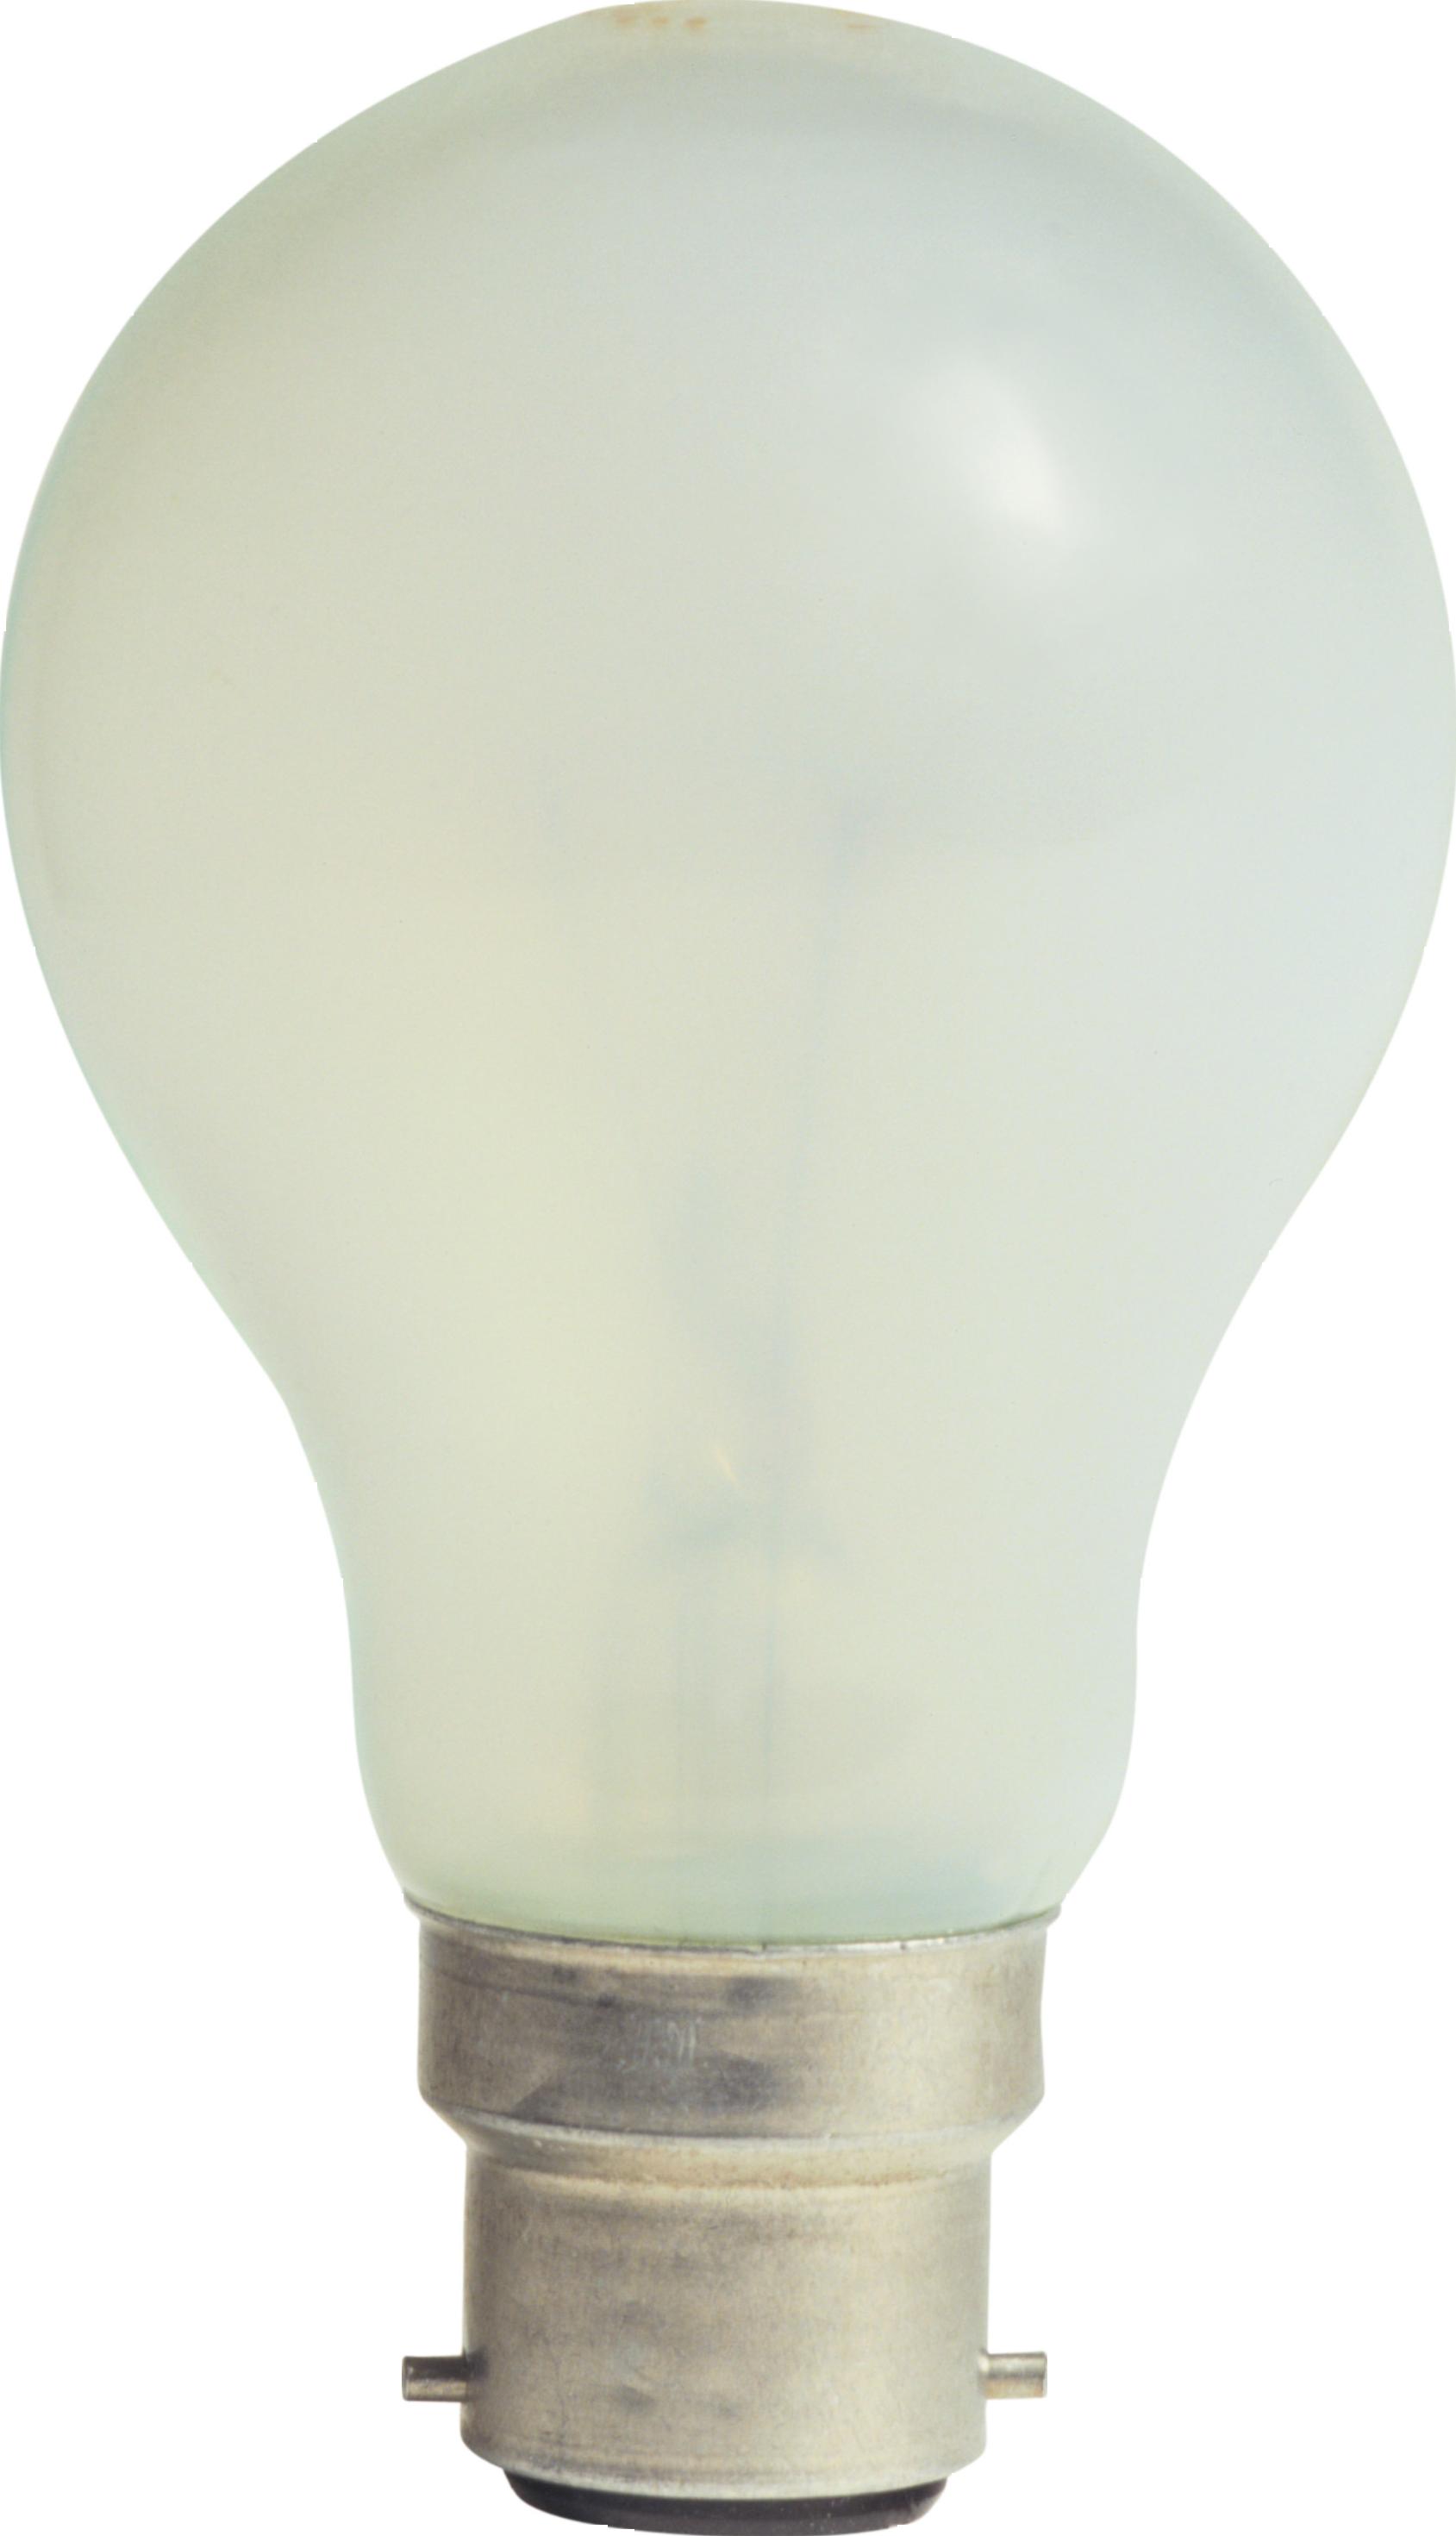 Lamp Png Image Lamp Lights Electric Lighter